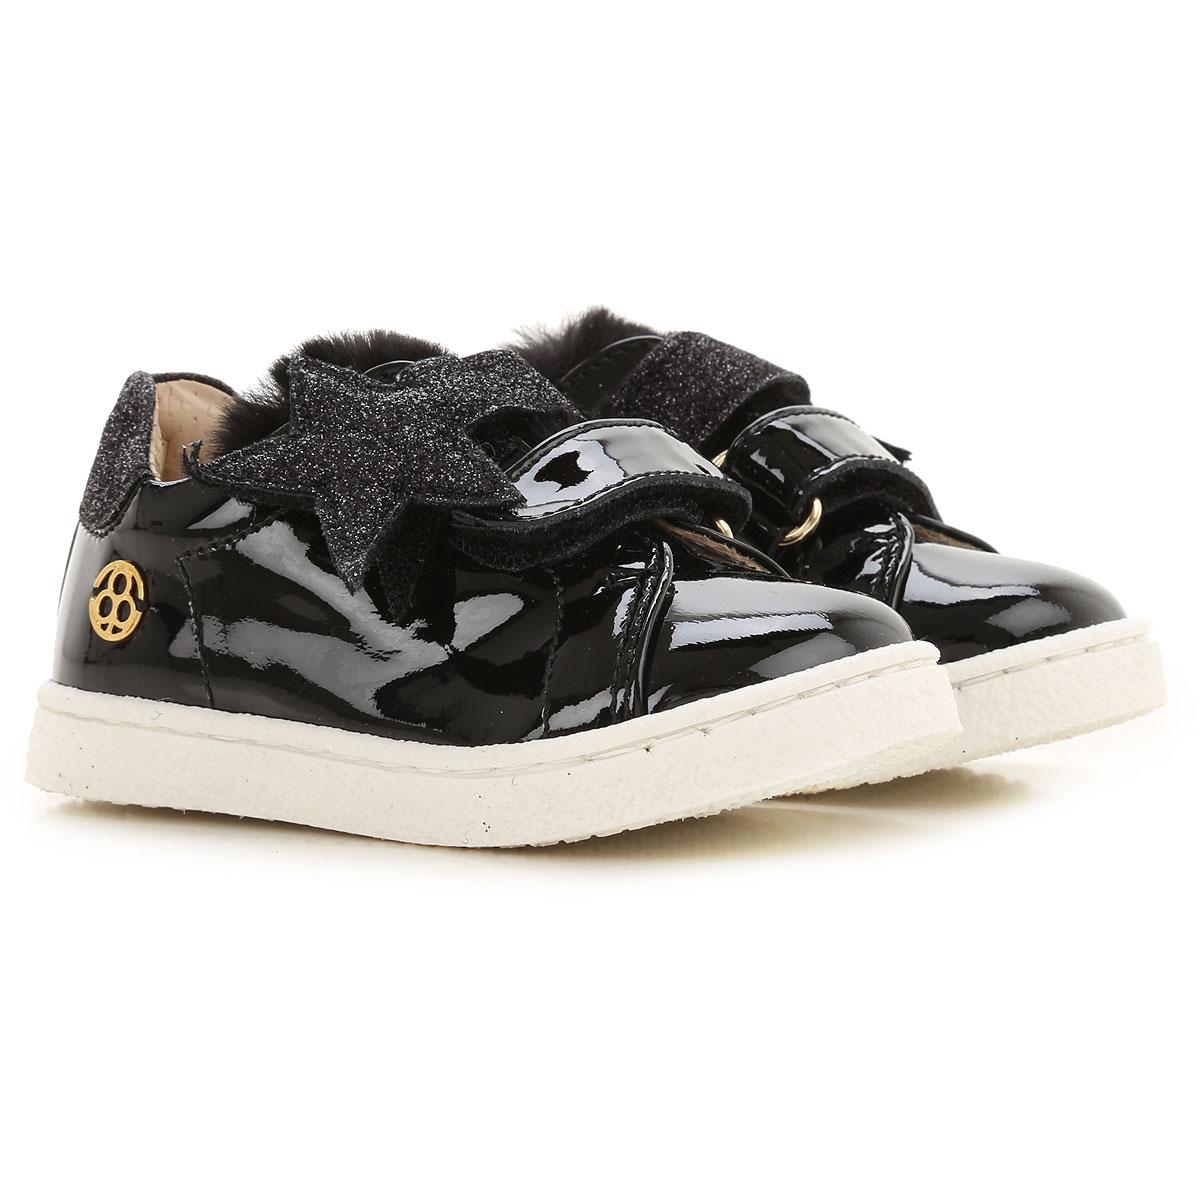 Florens Kids Shoes for Girls On Sale, Black, Rubber, 2019, 18 19 20 21 22 23 24